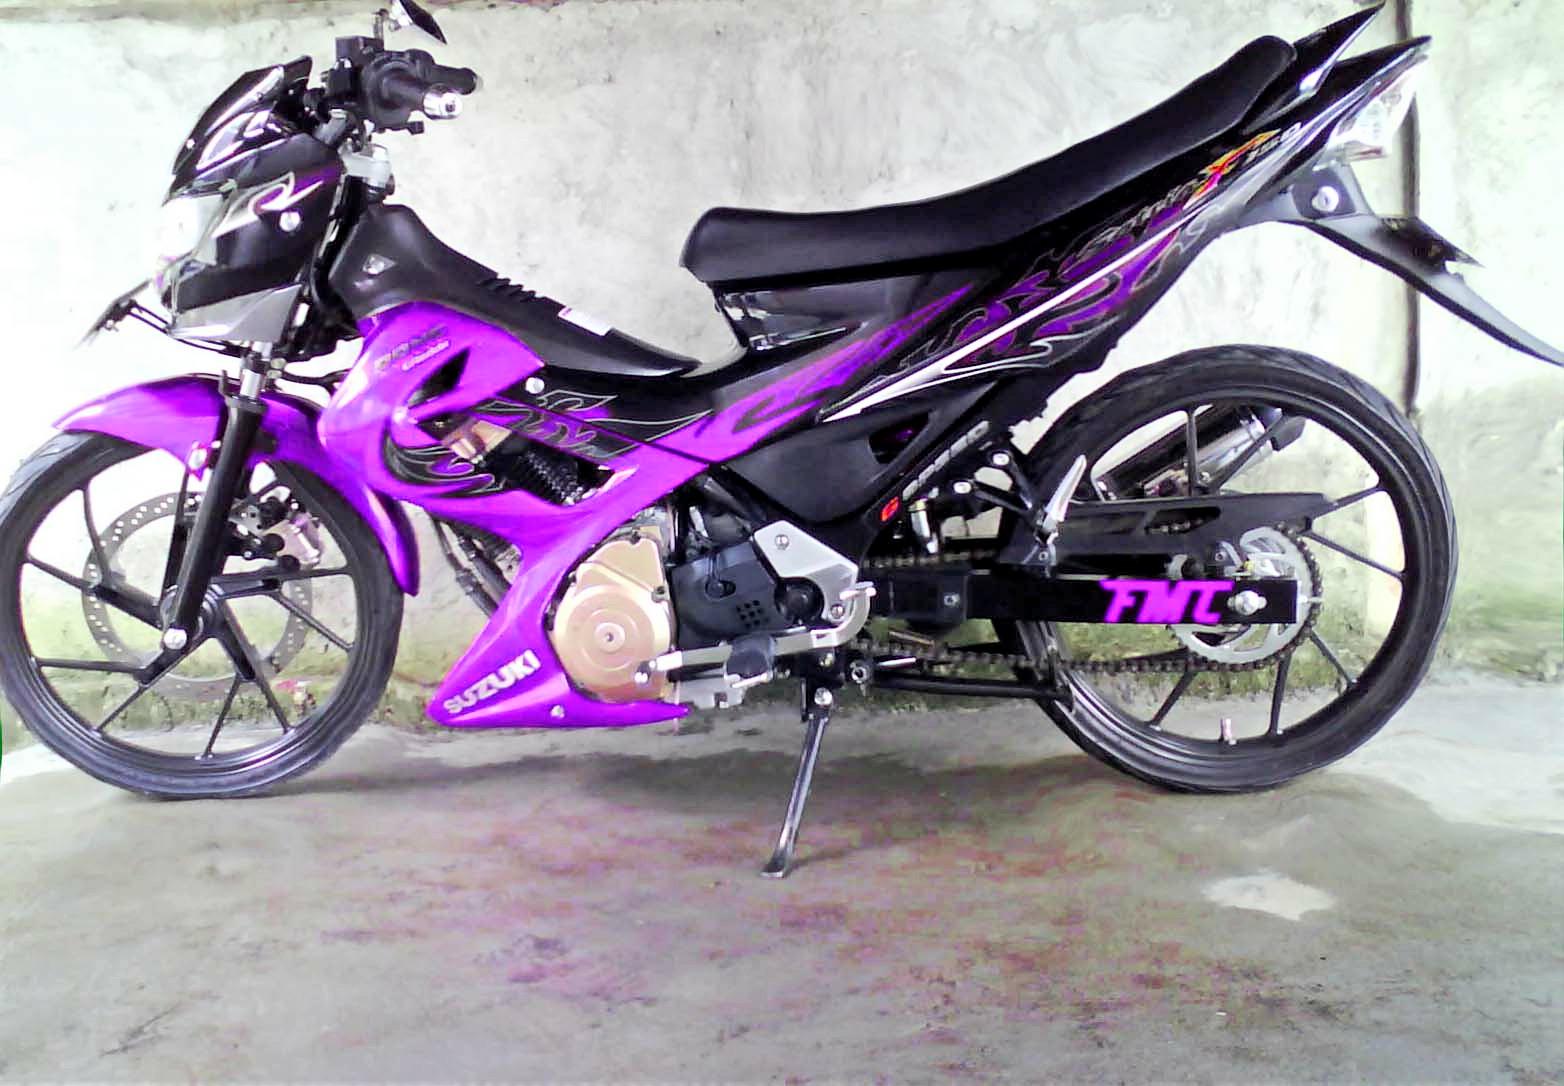 Foto Modifikasi Motor Suzuki Satria FU 150 Terbaru title=